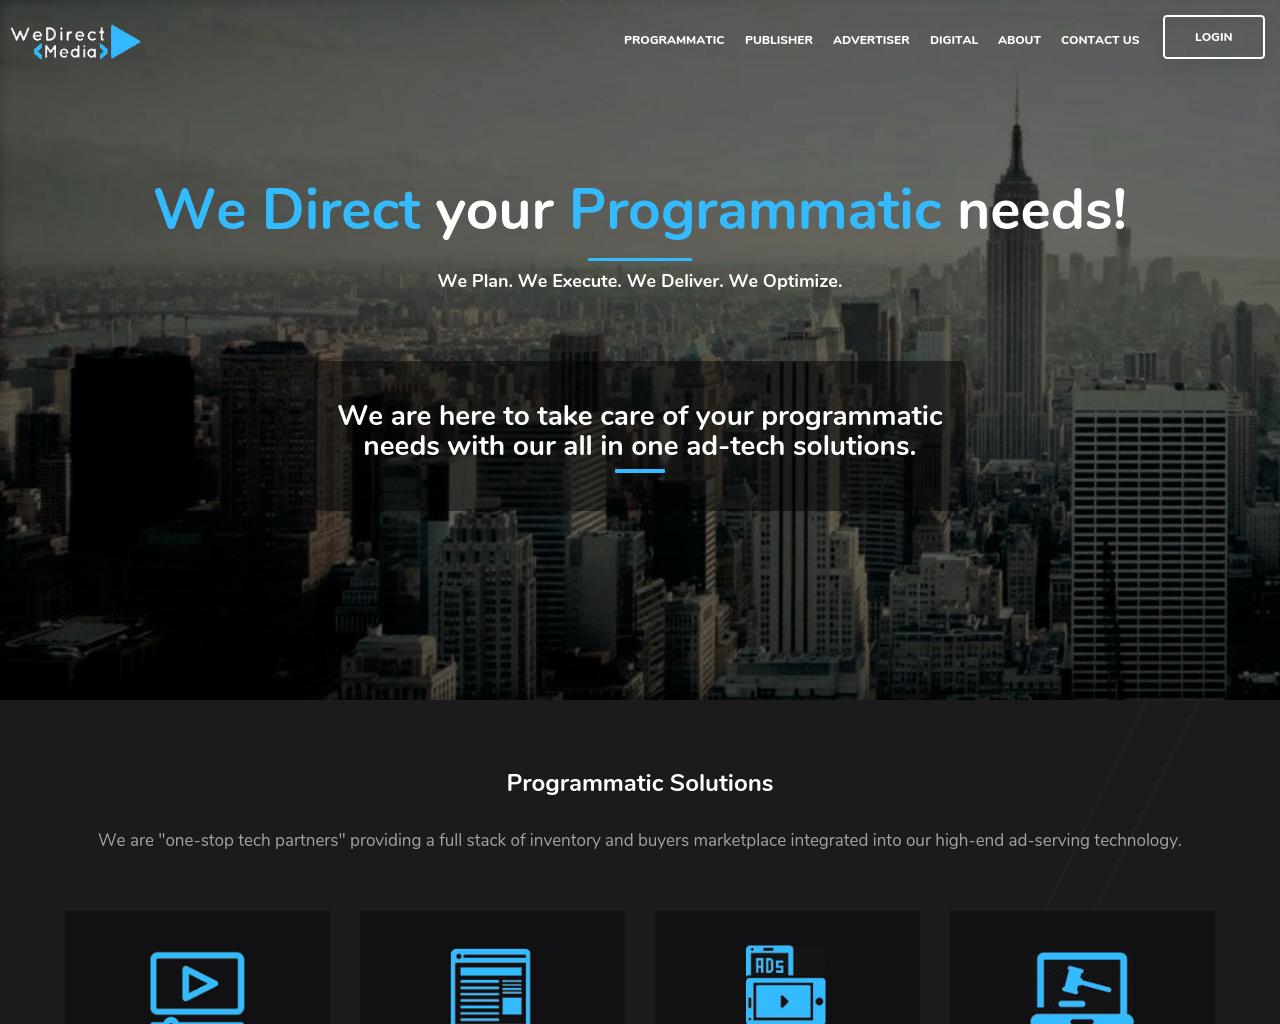 WeDirect-Media-Advertising-Reviews-Pricing